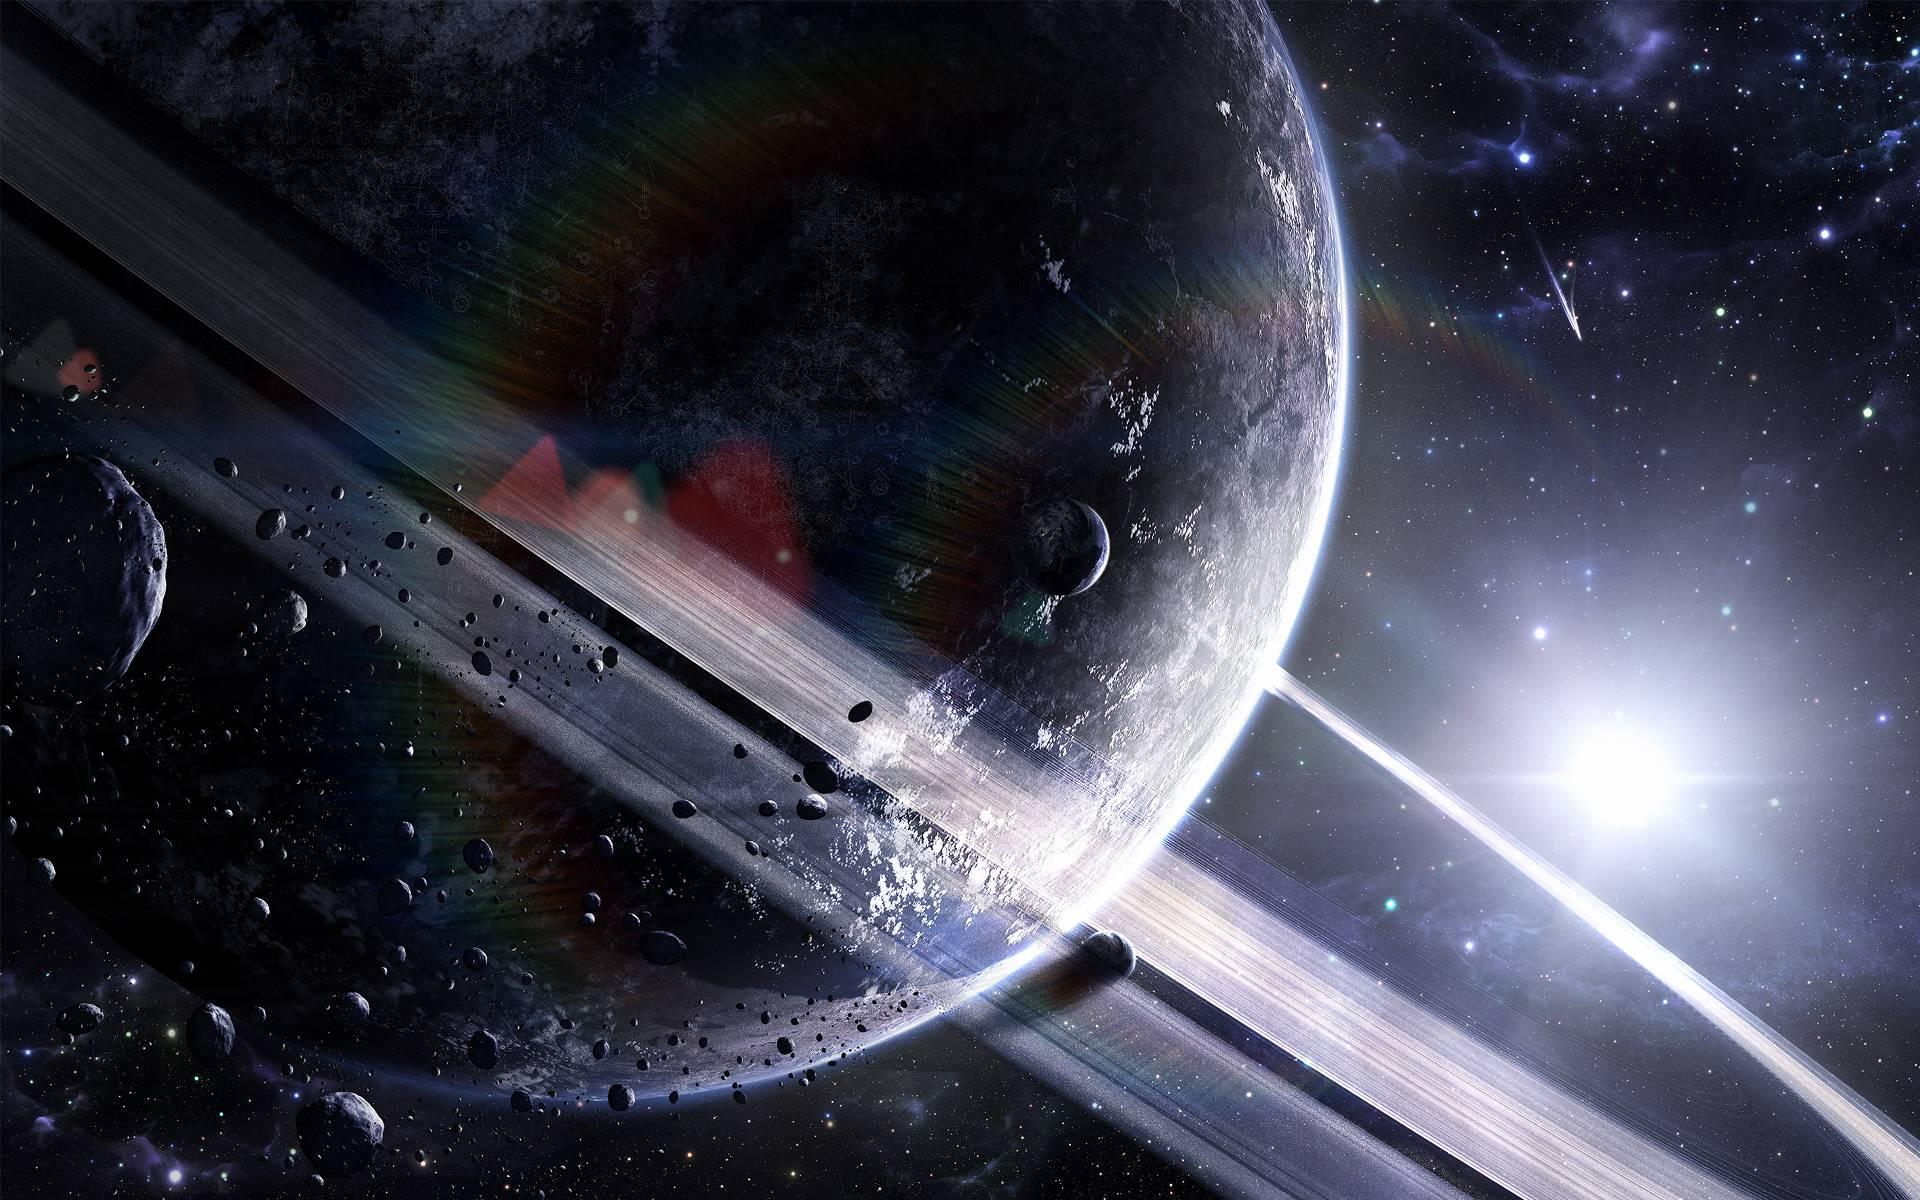 Space HD Wallpapers p Wallpaper